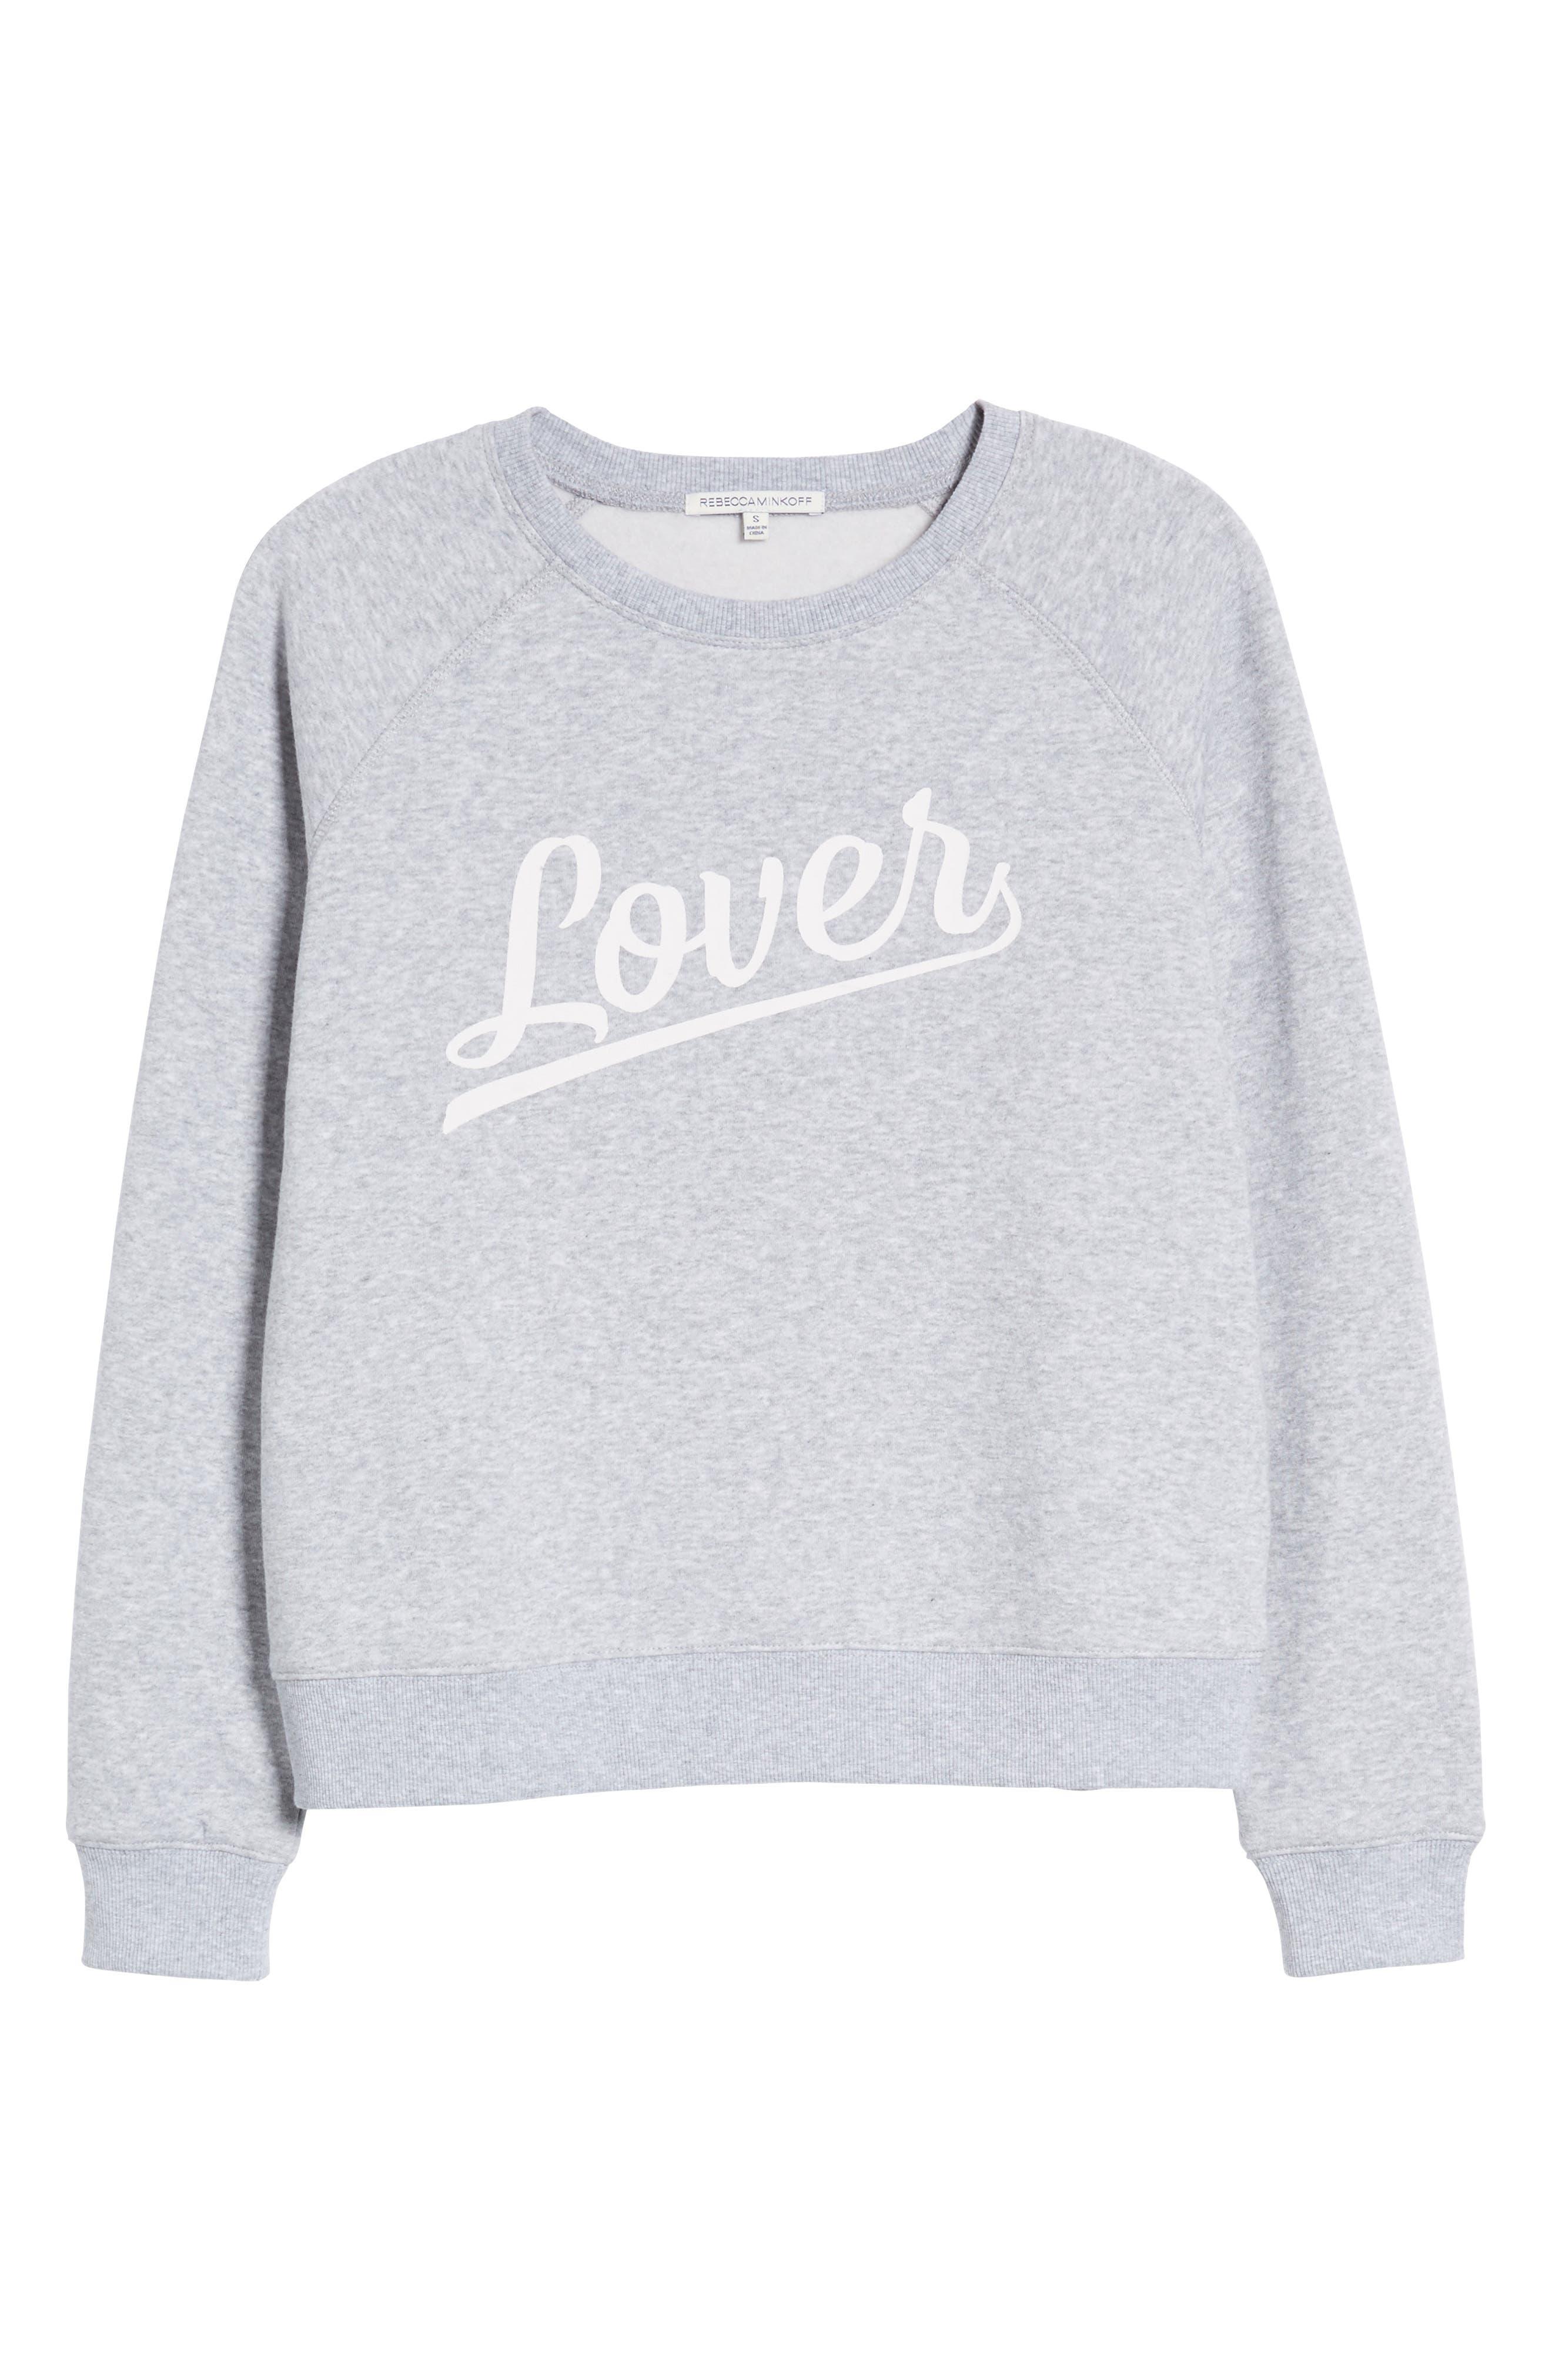 Lover Sweatshirt,                             Alternate thumbnail 7, color,                             038